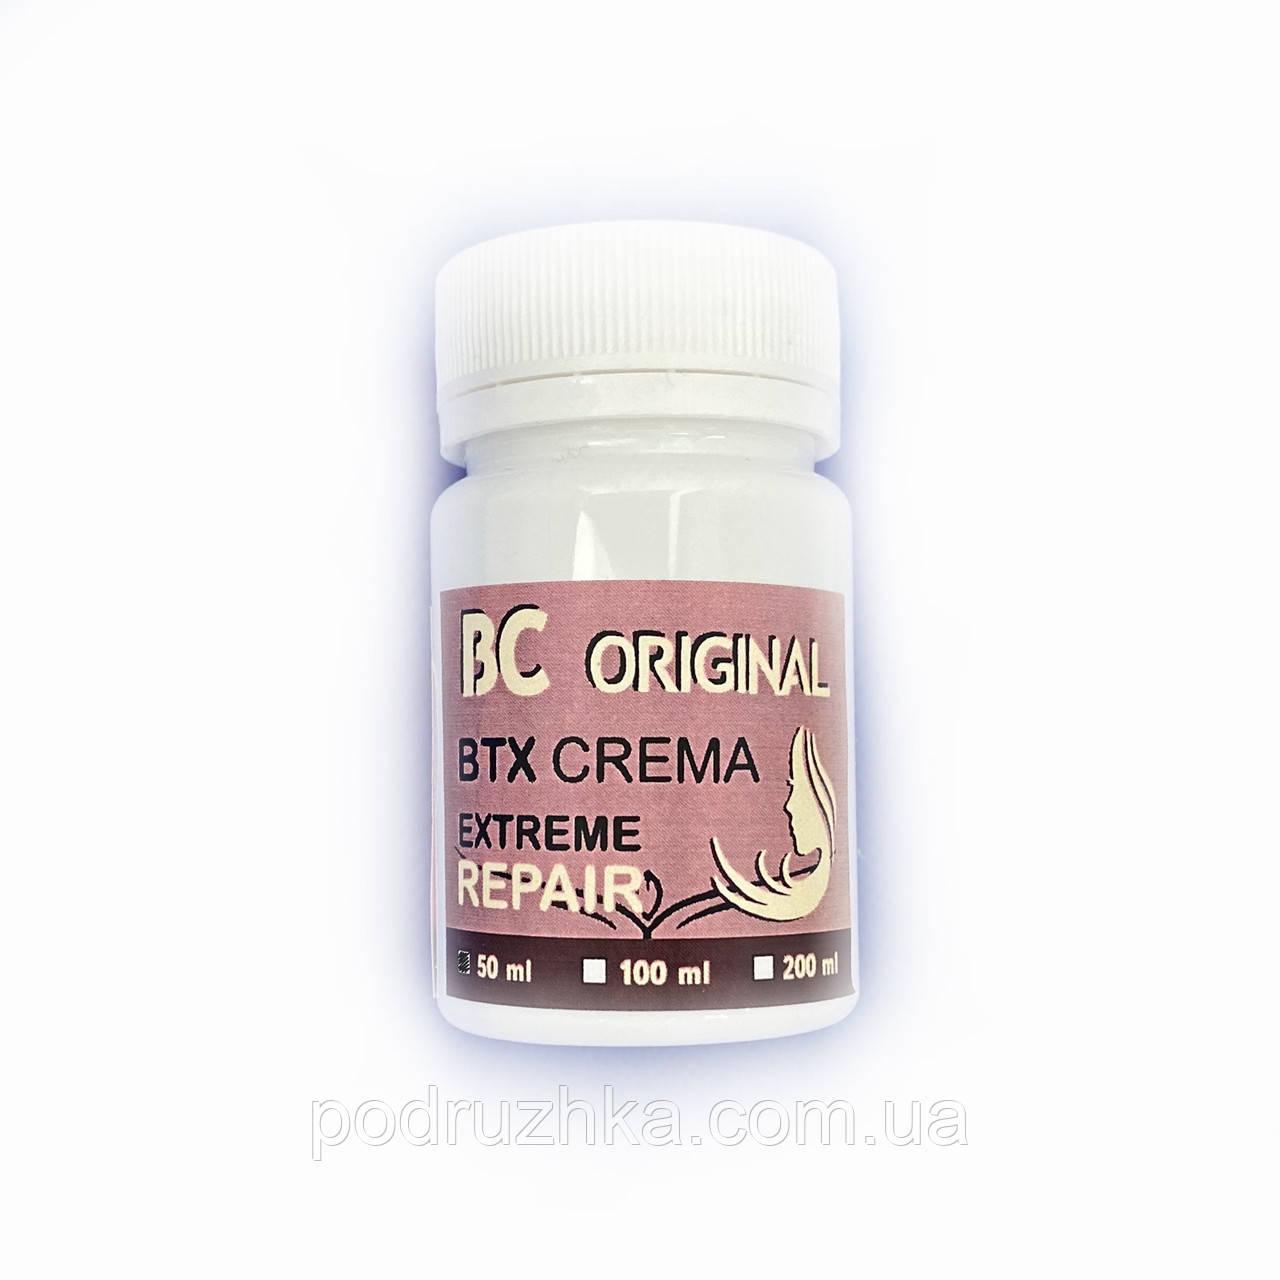 Бoтoкc BC Original BTX Crema, 50 мл